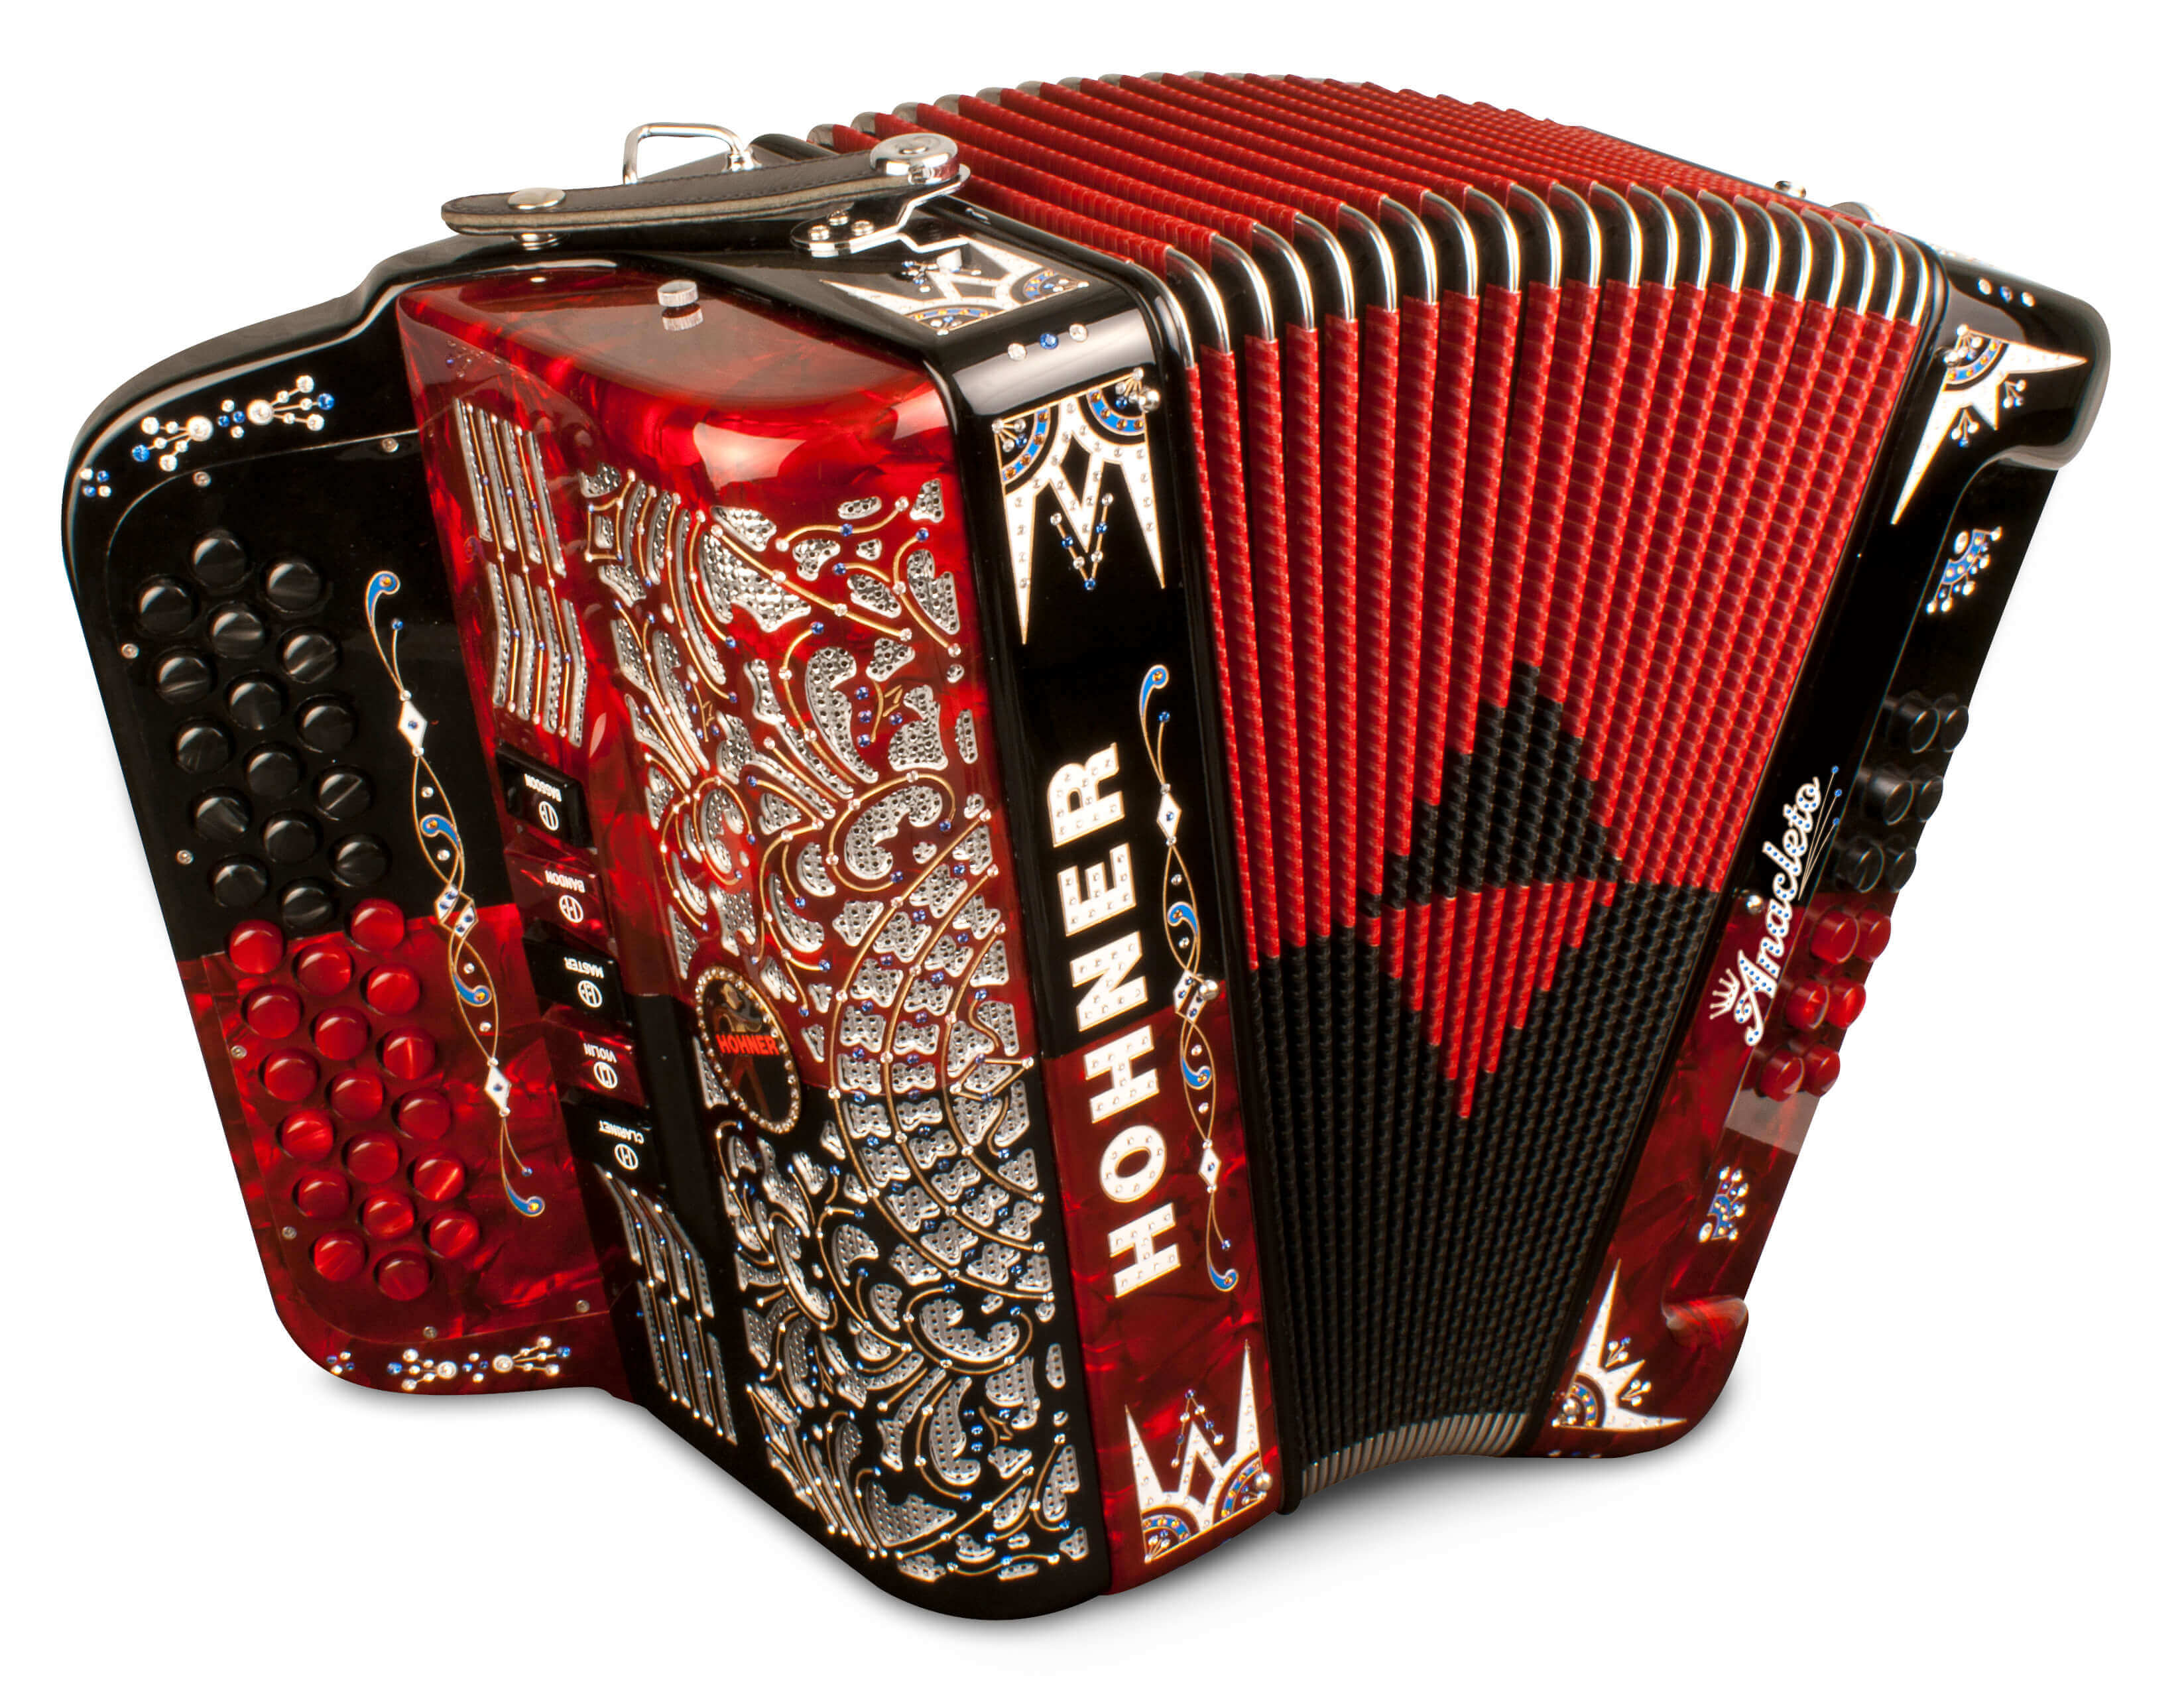 hohner accordion models pdf file